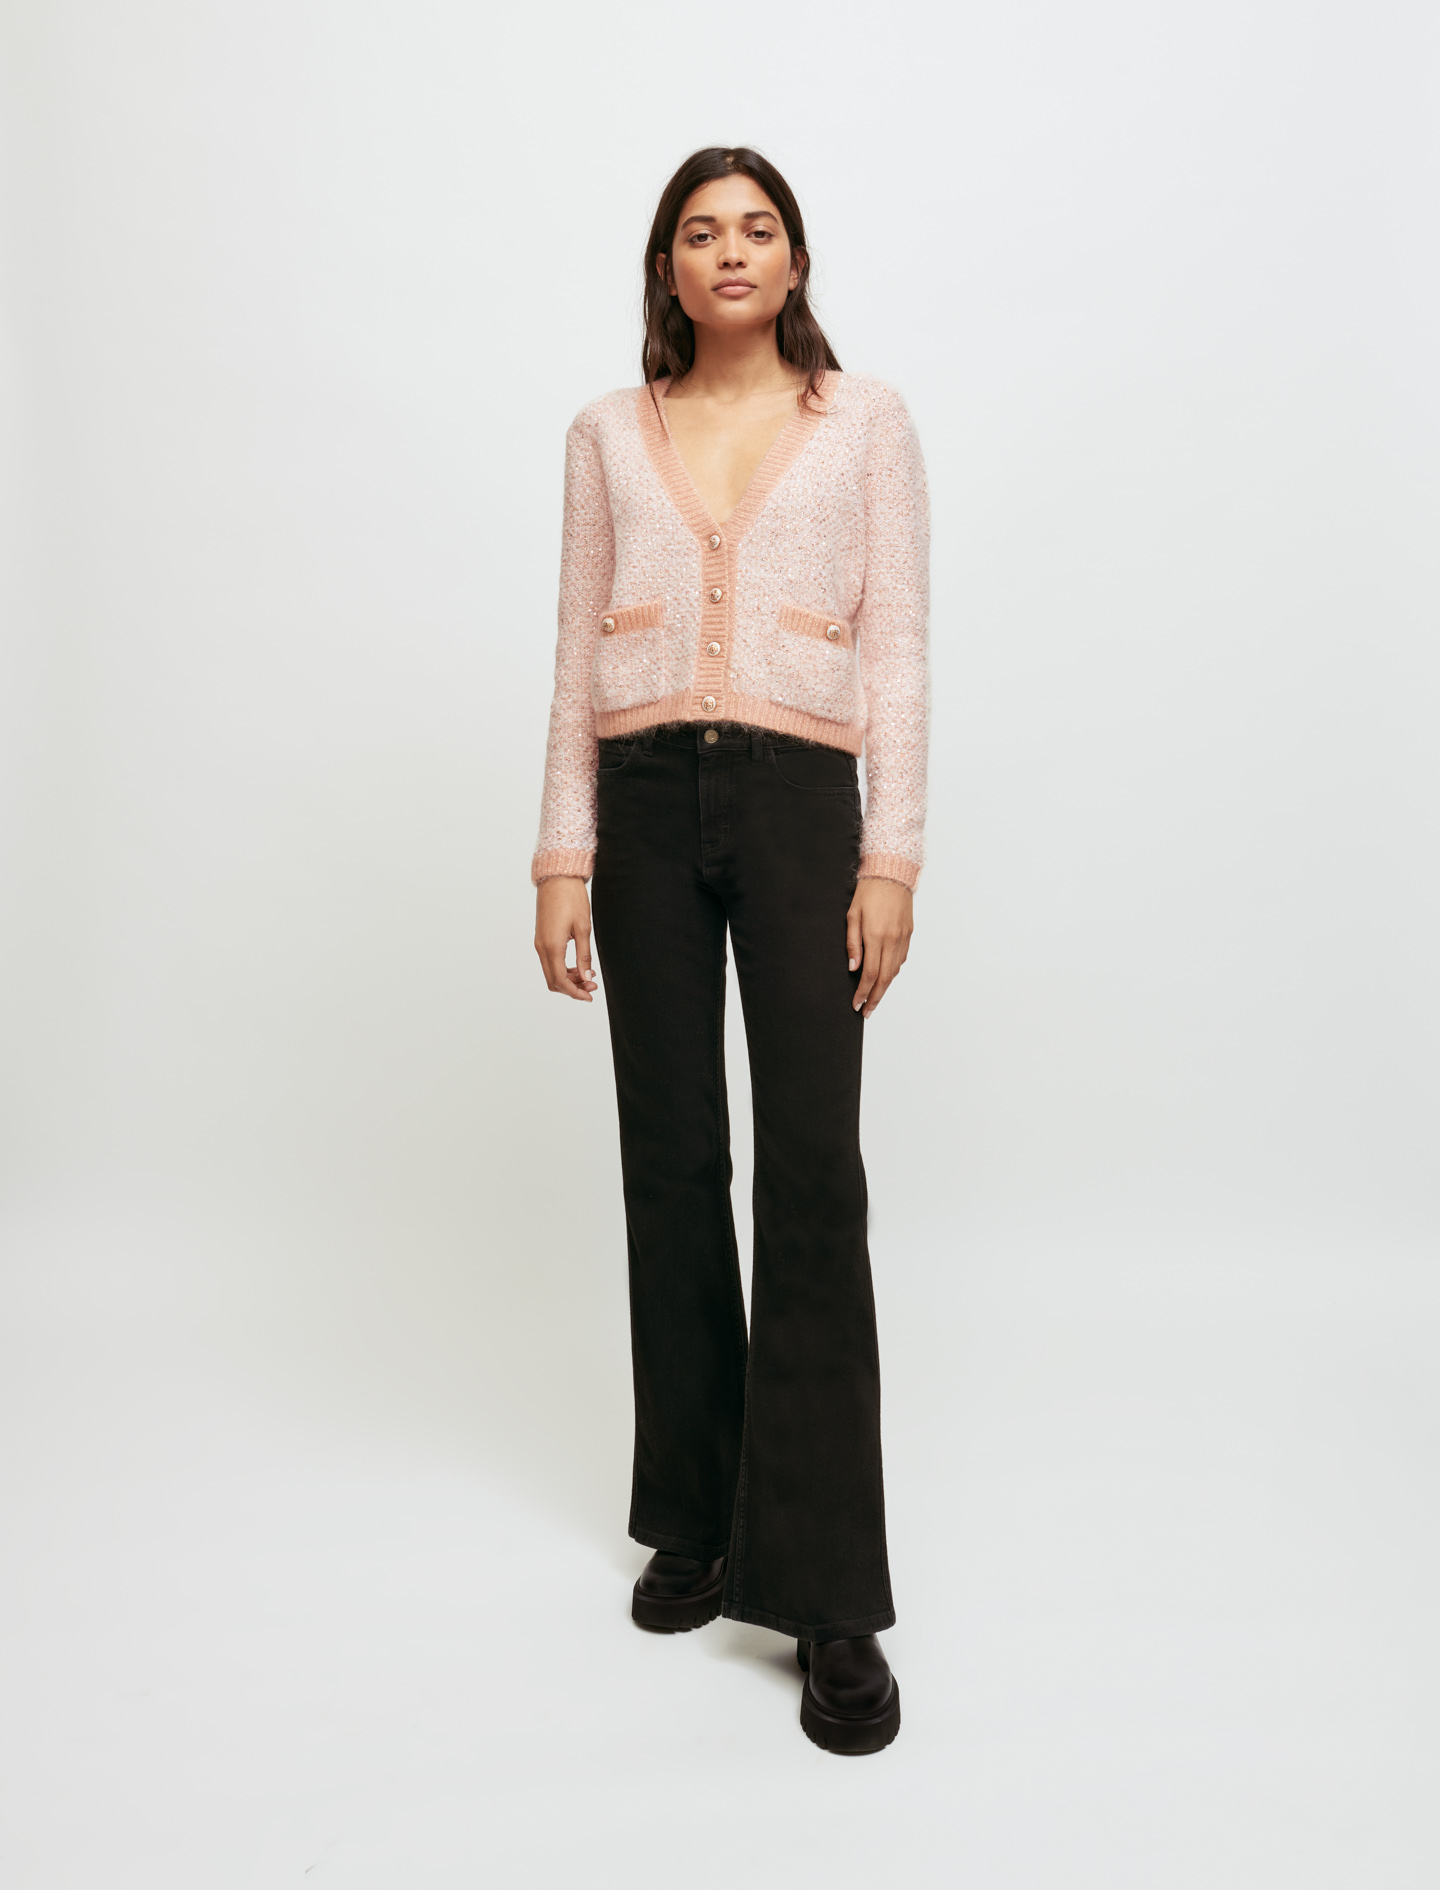 Decorative Knit Cardigan - Pink